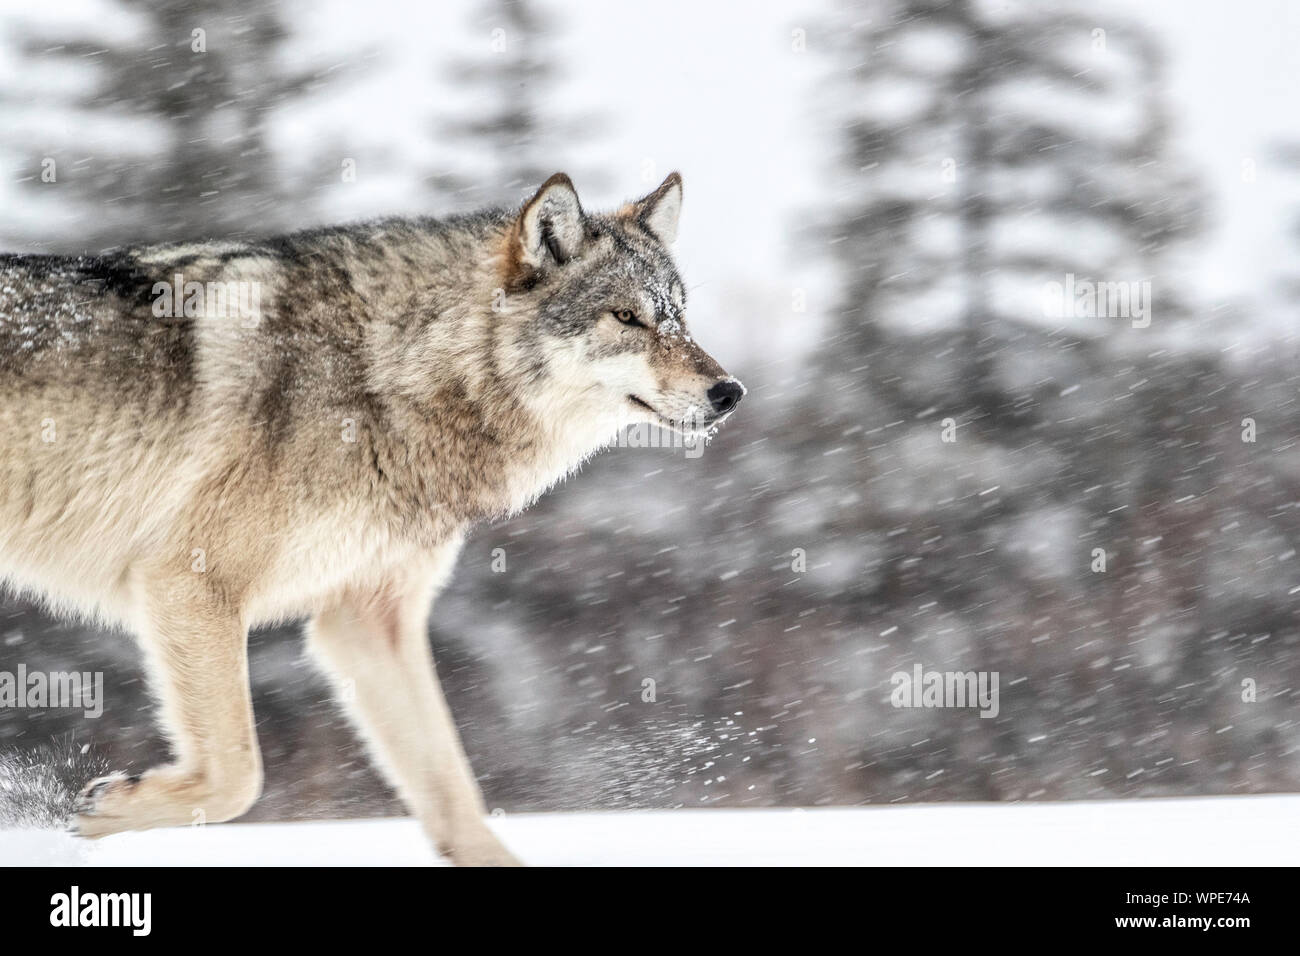 Canadian Timber Wolf walks in the snow, Nanuk Lodge, West Hudson Bay, Churchill, Manitoba, Canada Stock Photo